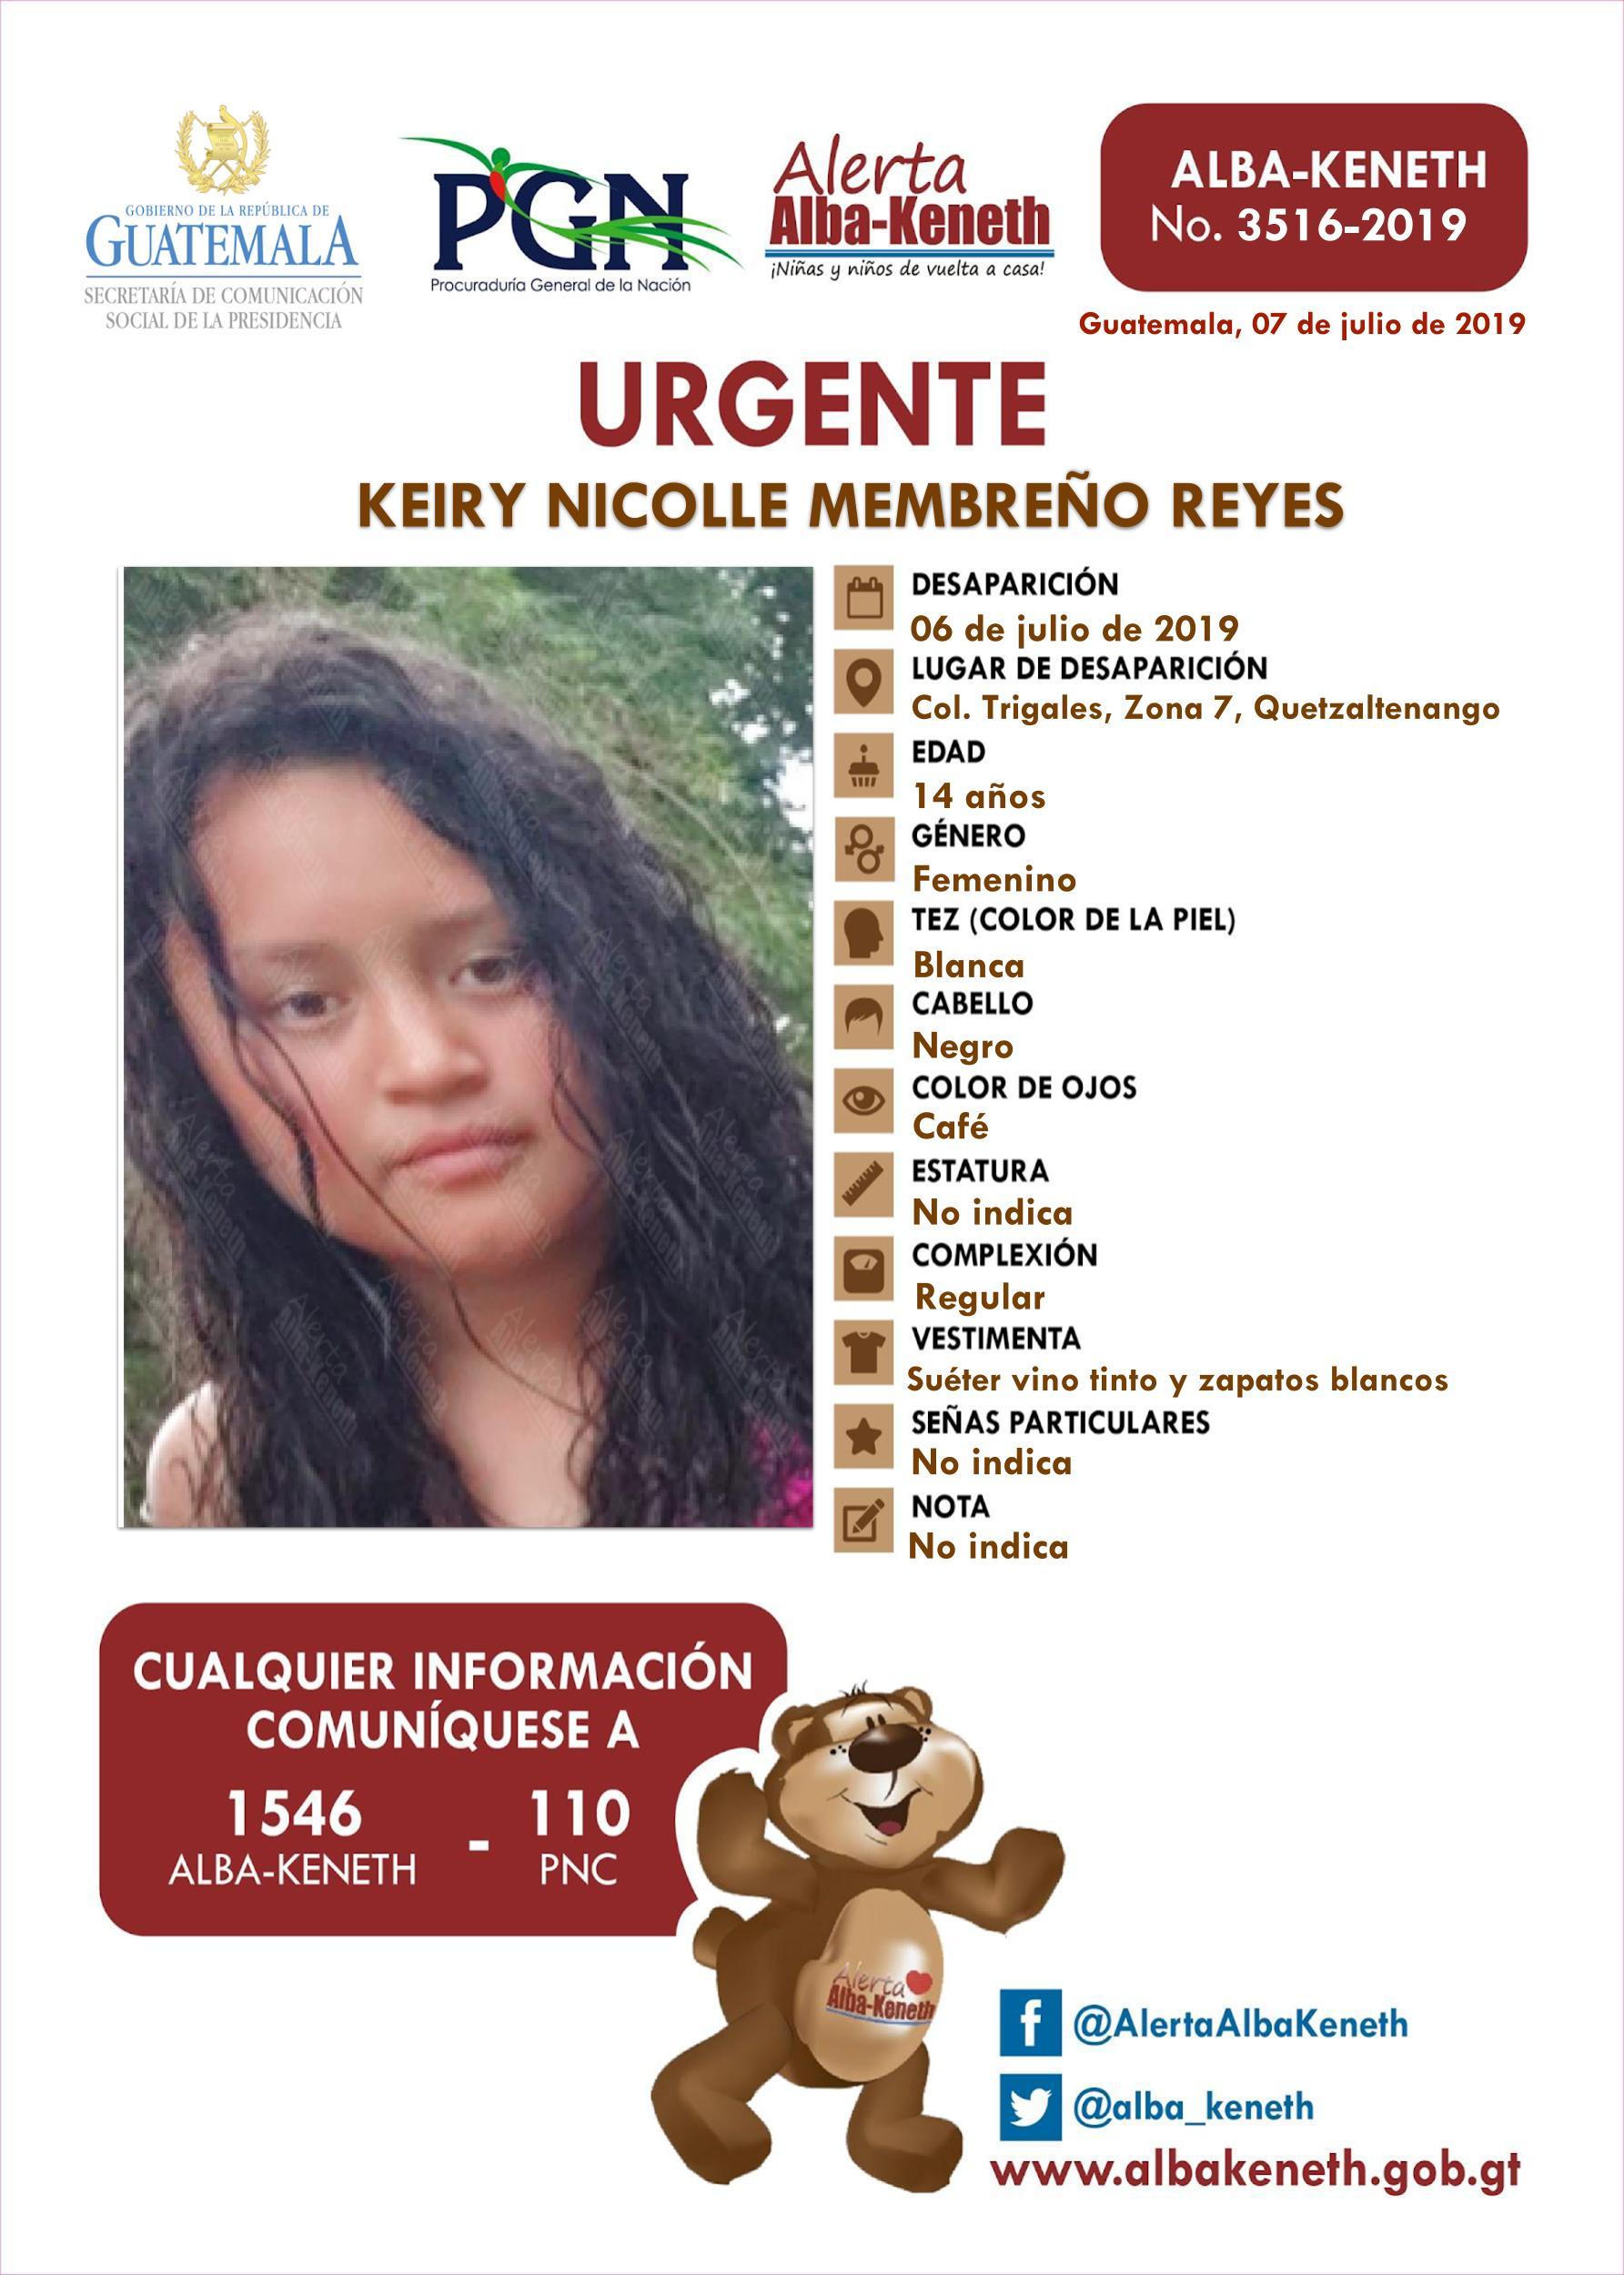 Keiry Nicolle Membreño Reyes